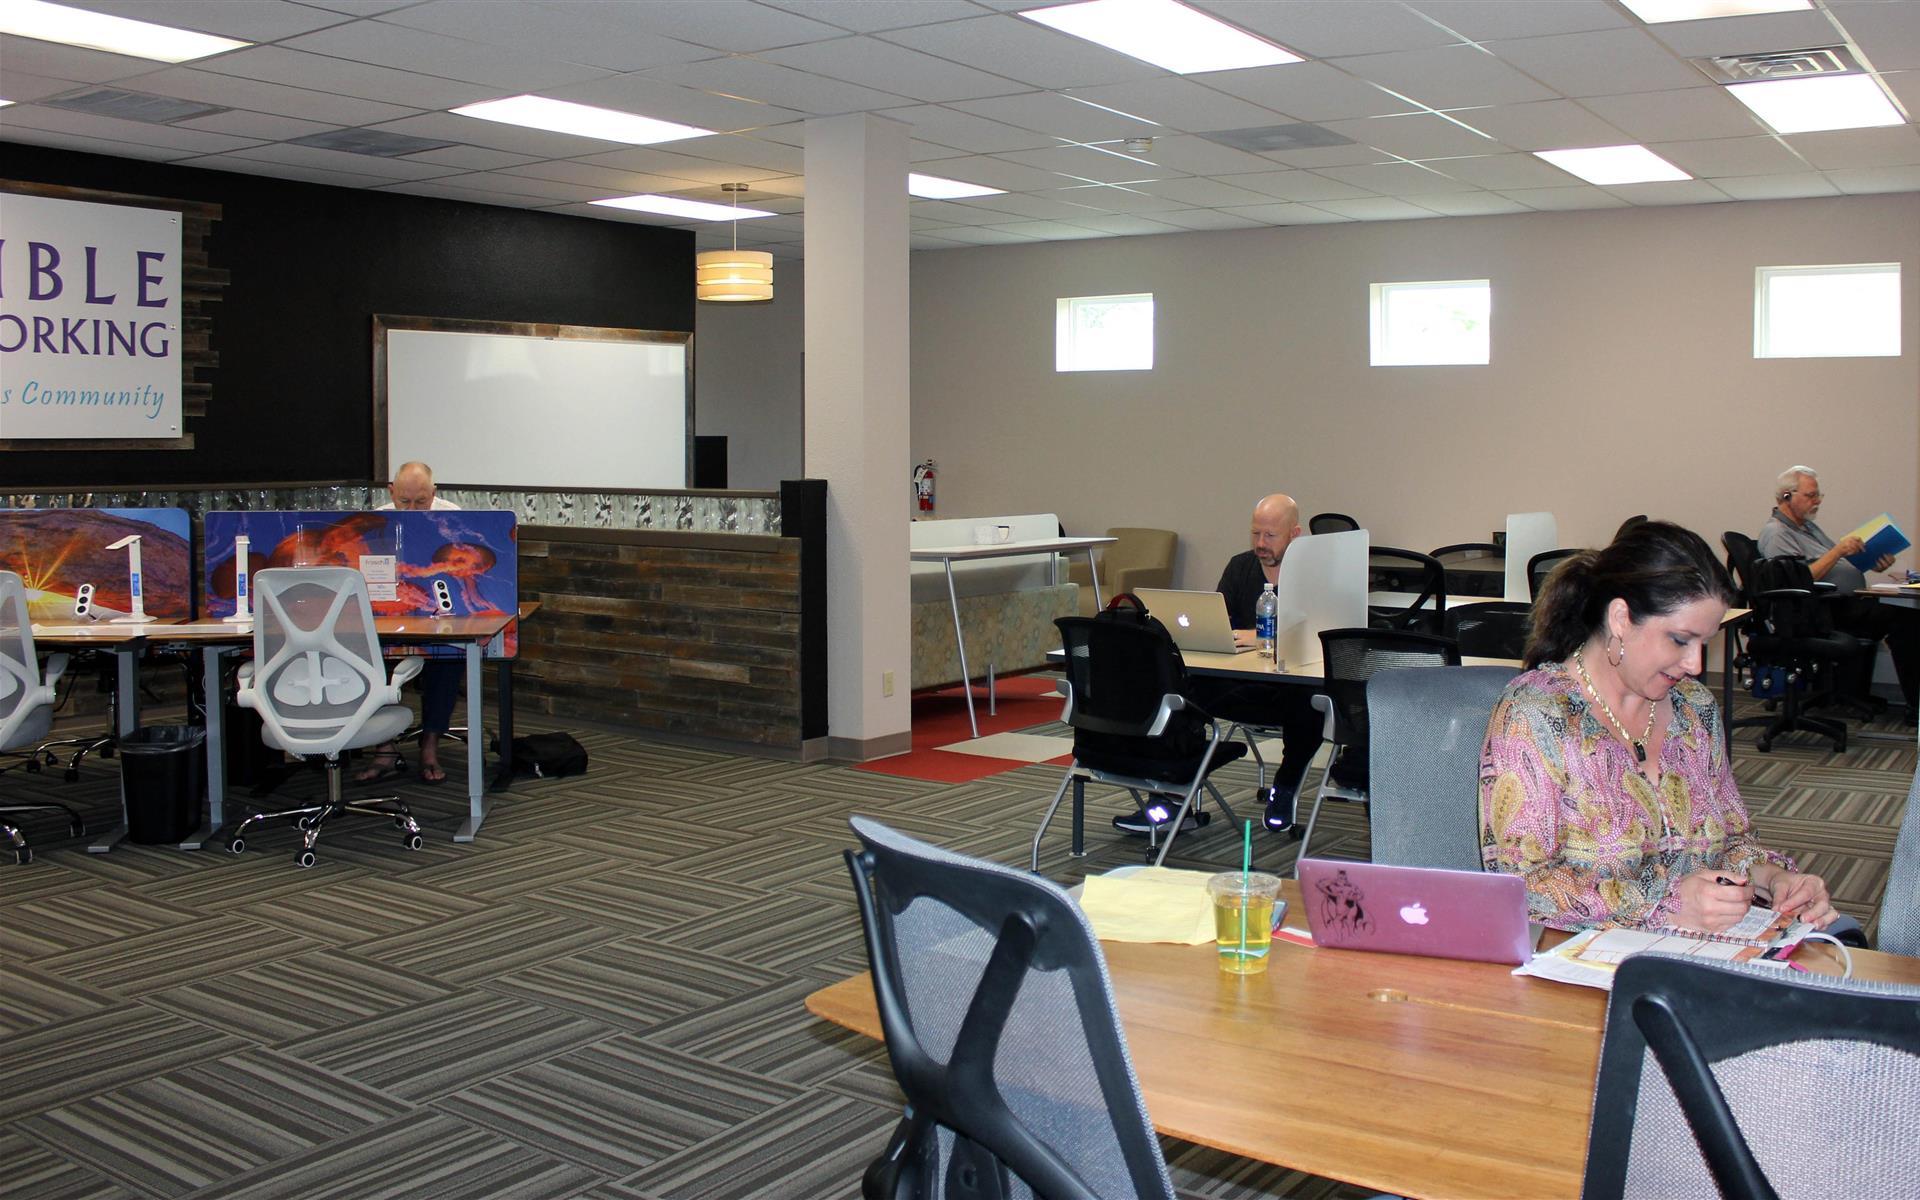 Ensemble Coworking - Drop-in Flexible Workspace